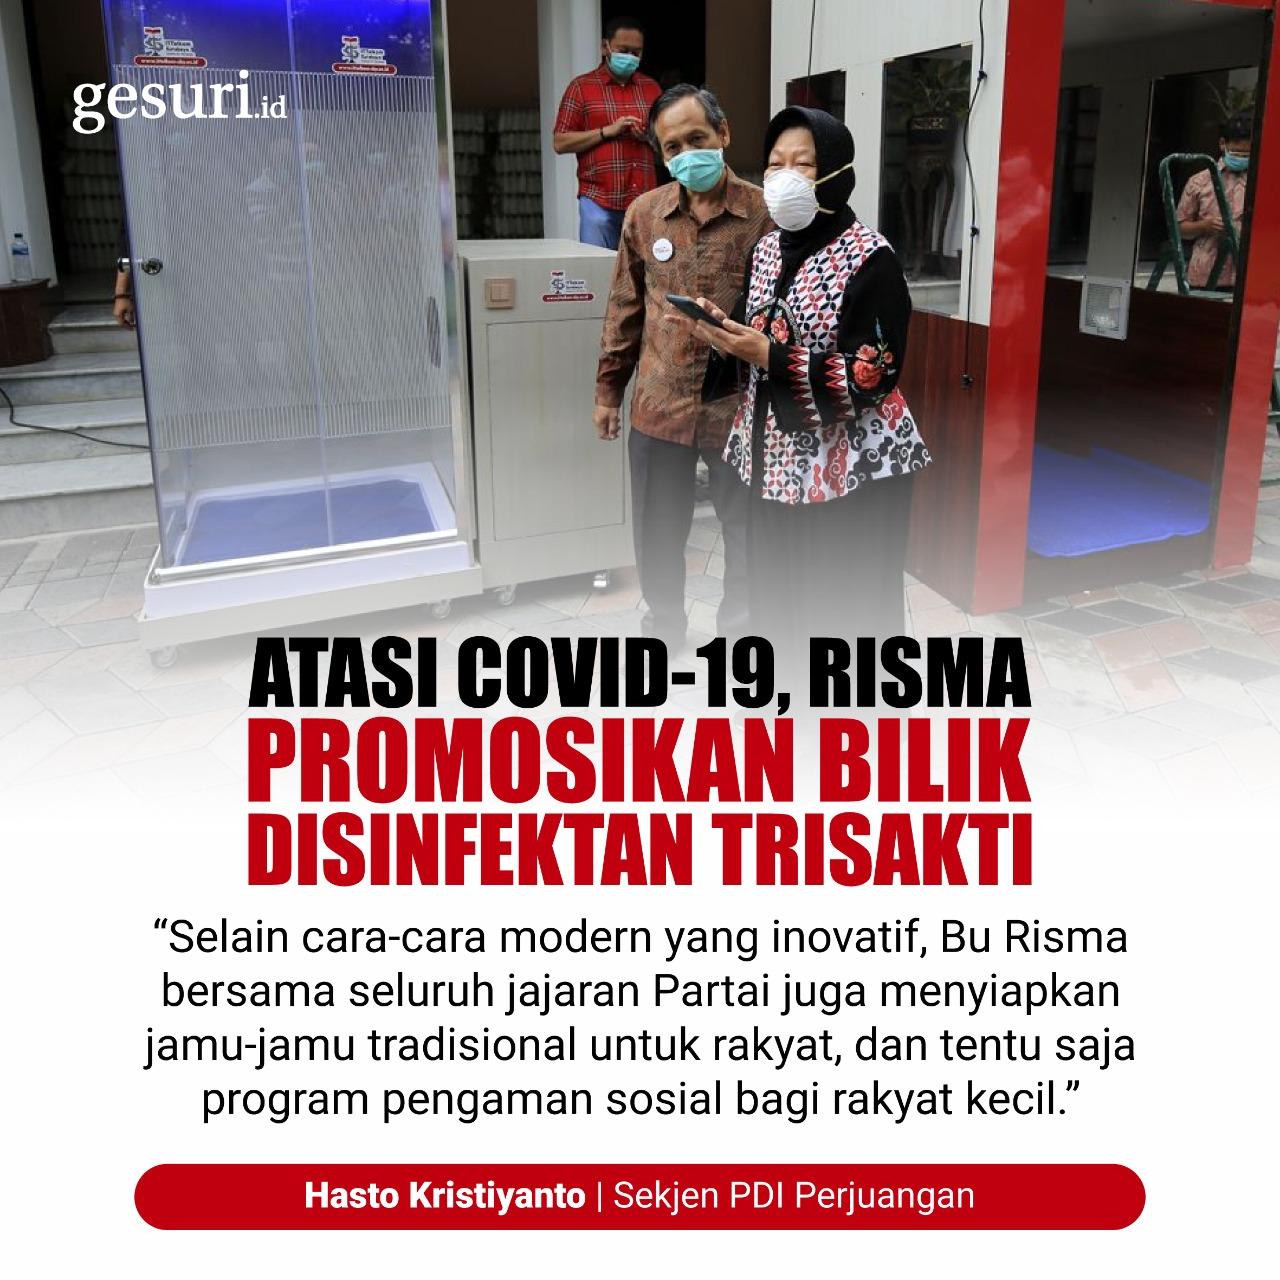 Atasi Covid-19, Risma Promosikan Bilik Disinfektan Trisakti